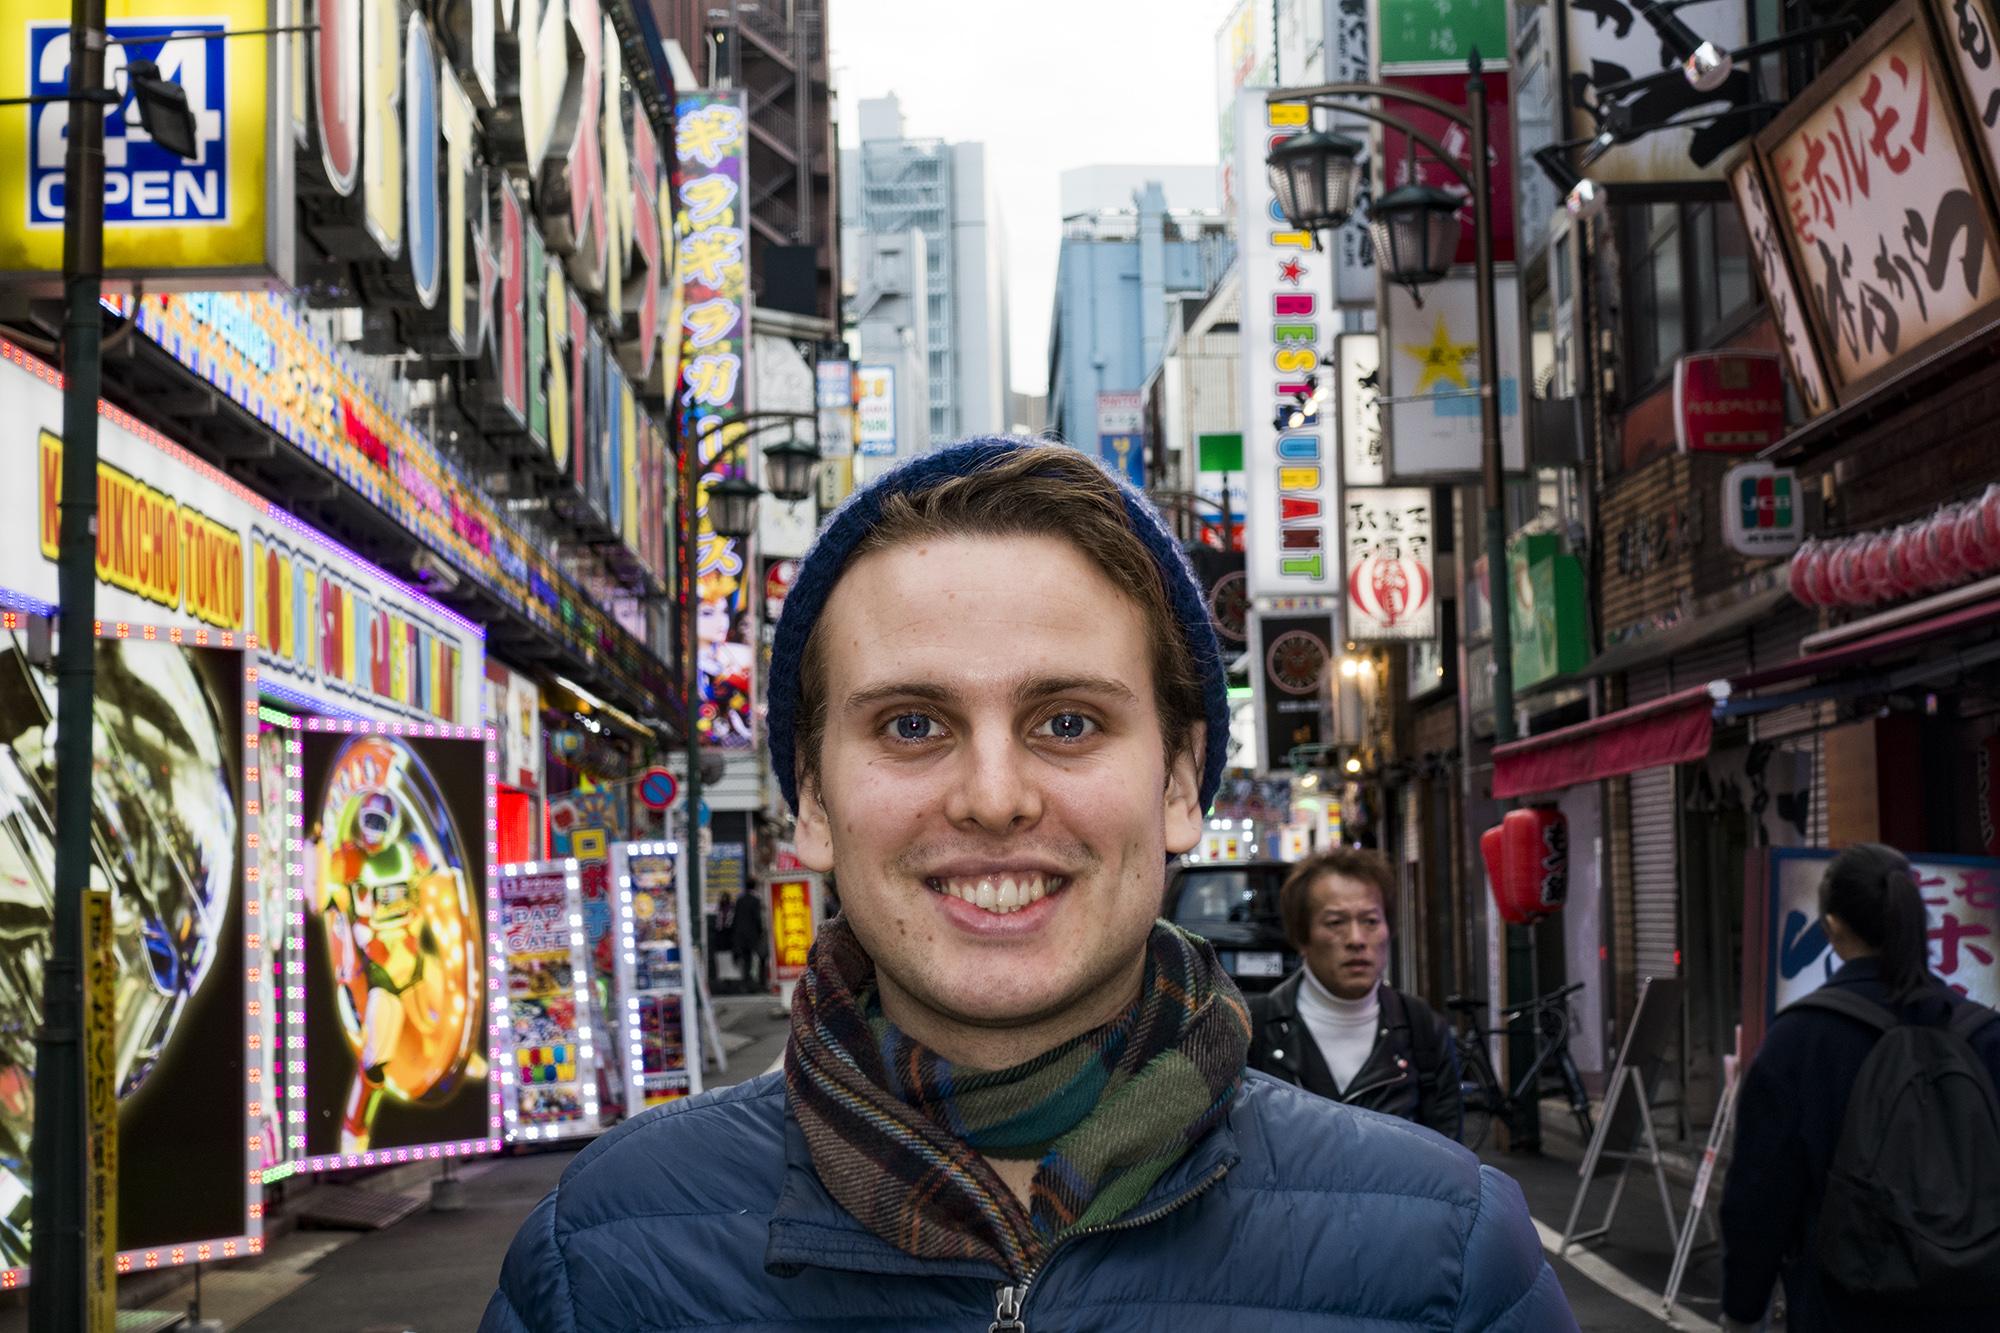 Jakob in Kabukichouヤコッブさん、歌舞伎町で